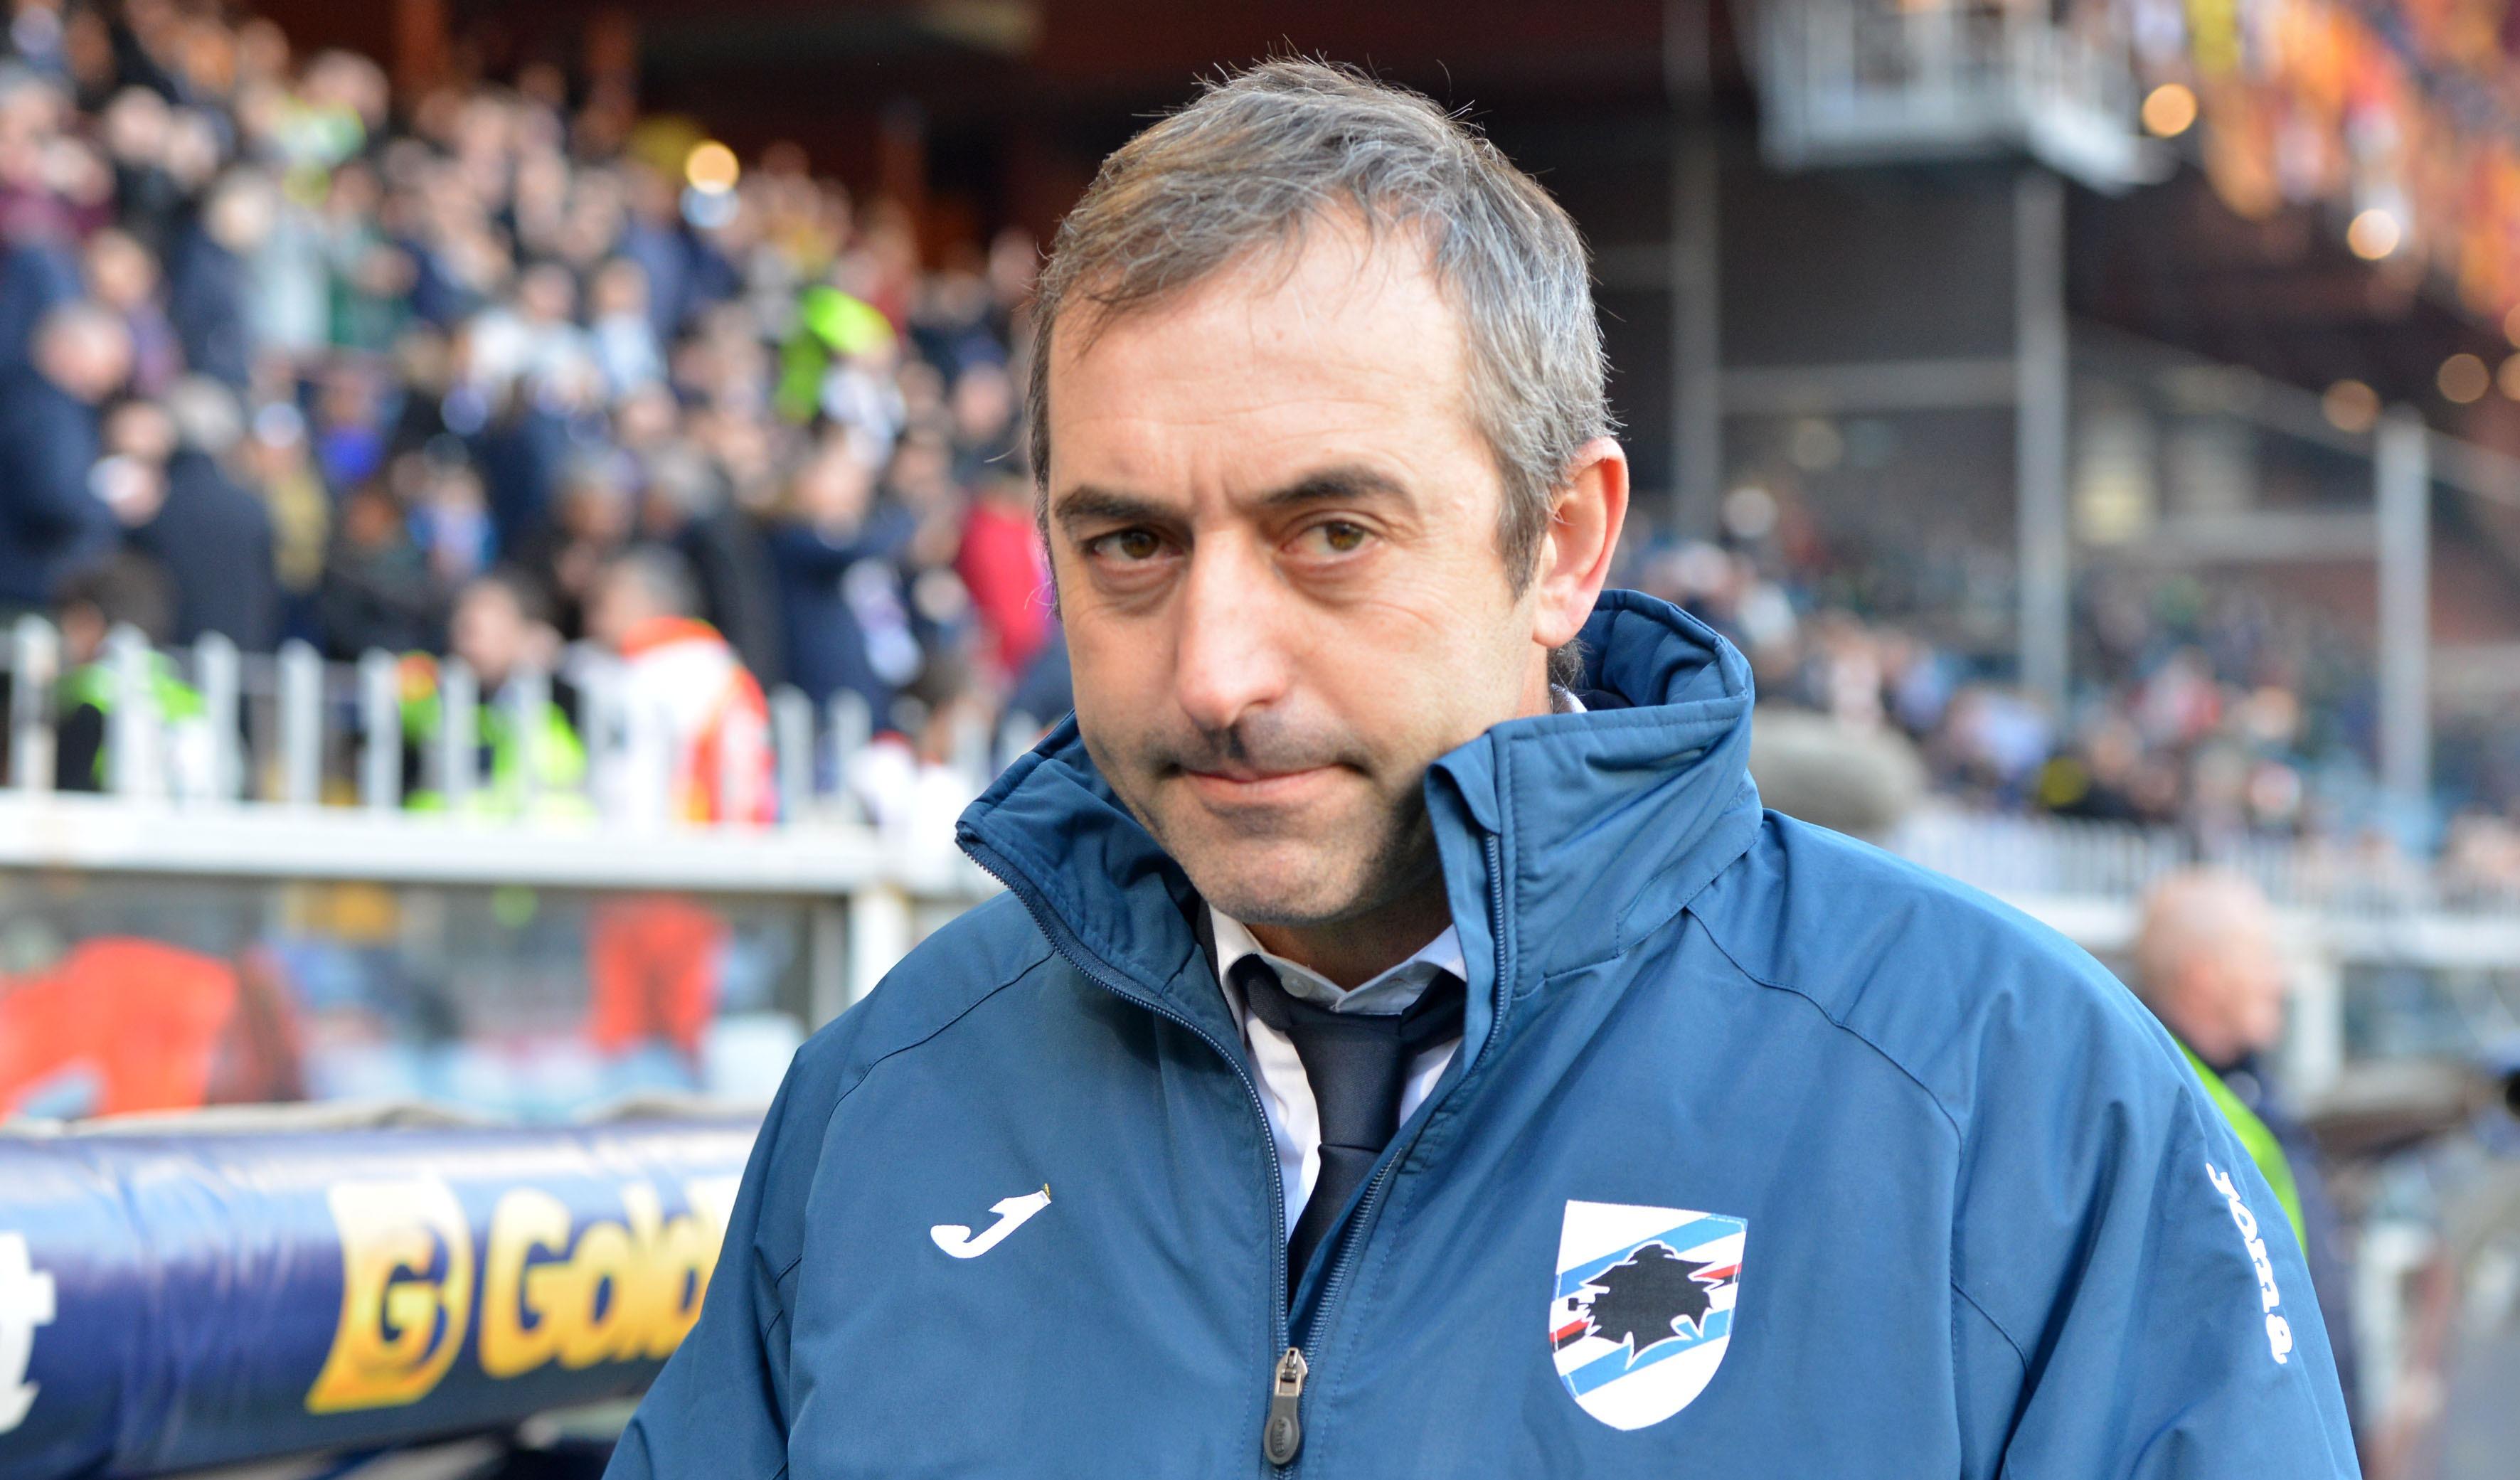 Giampaolo Berharap Jadi Manajer Barcelona